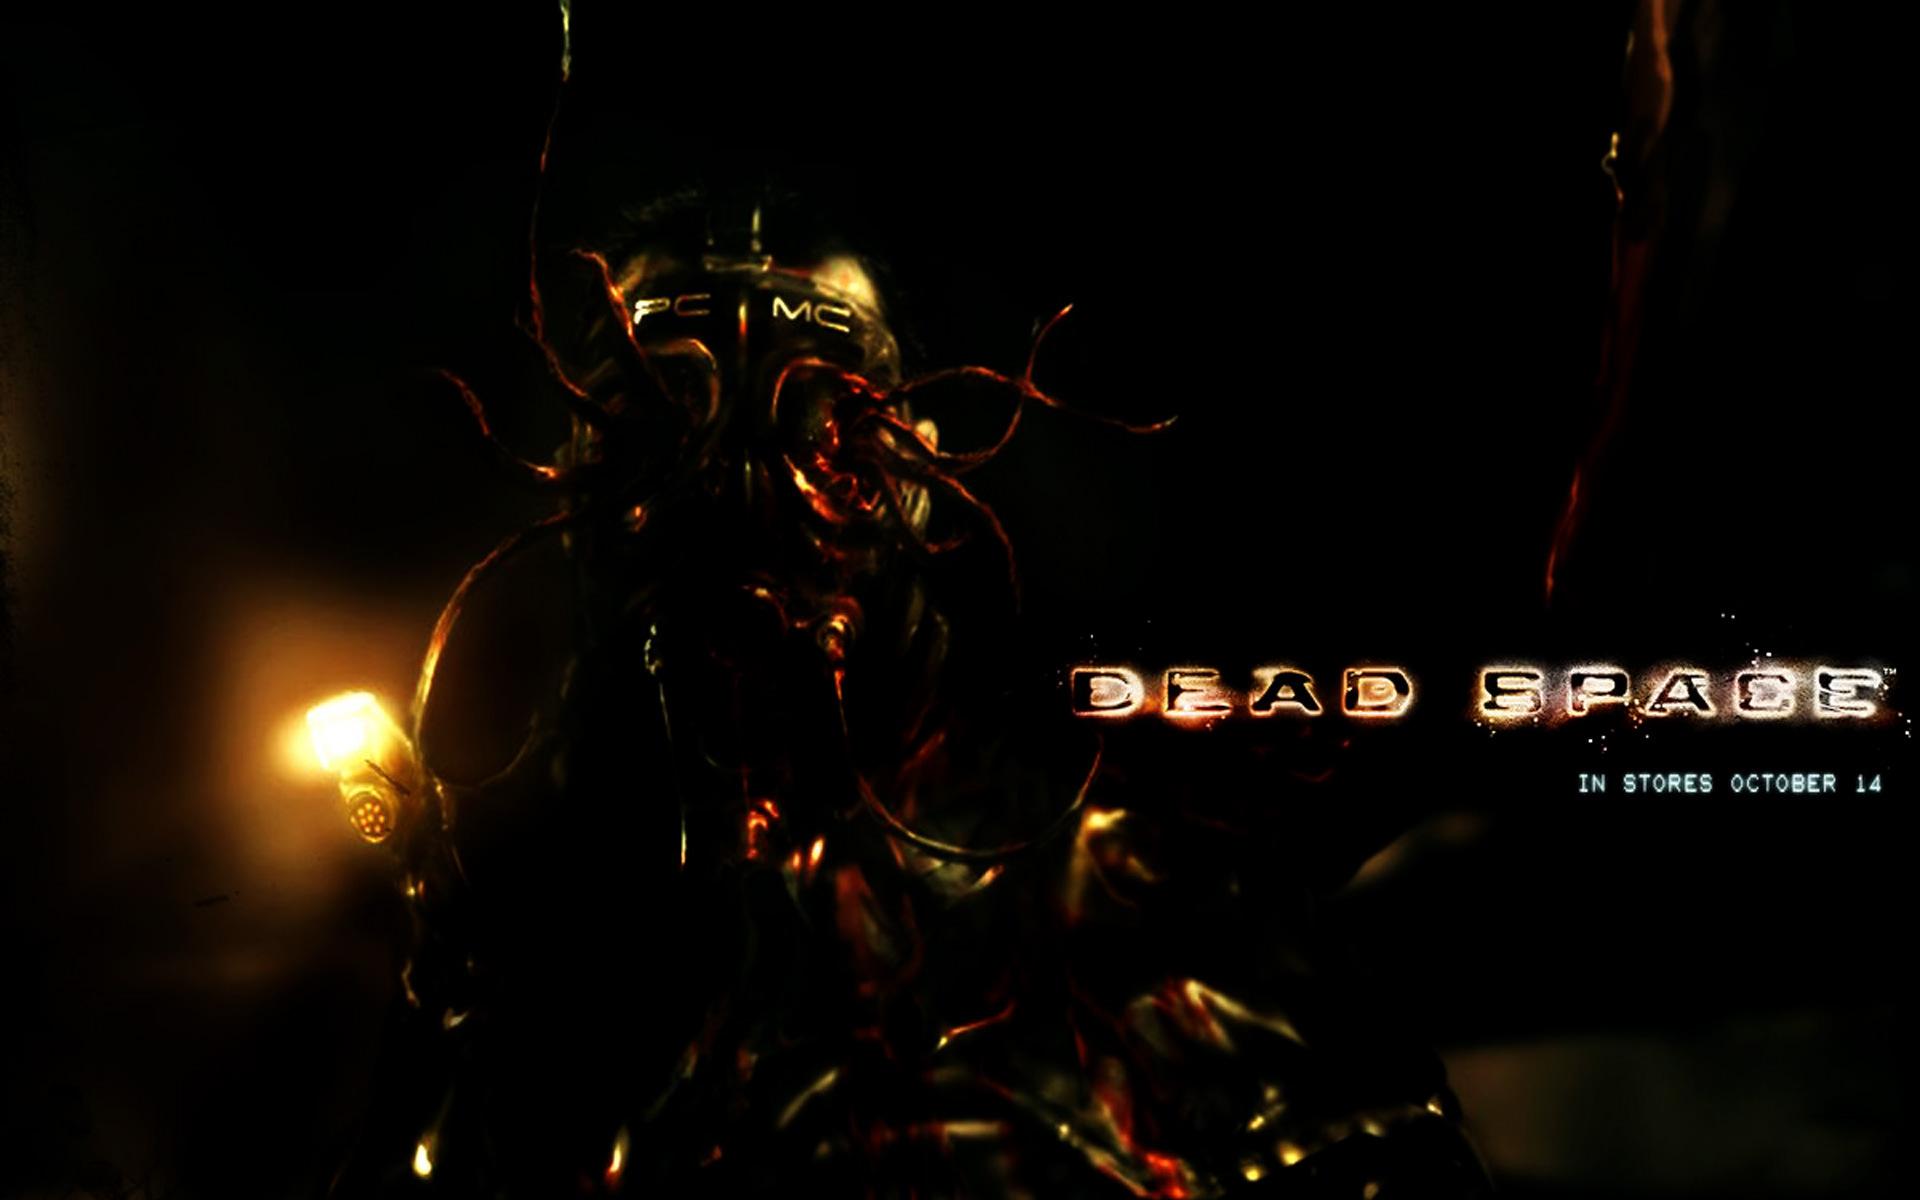 dead-space-extraction-art-003-1920x1200.jpg